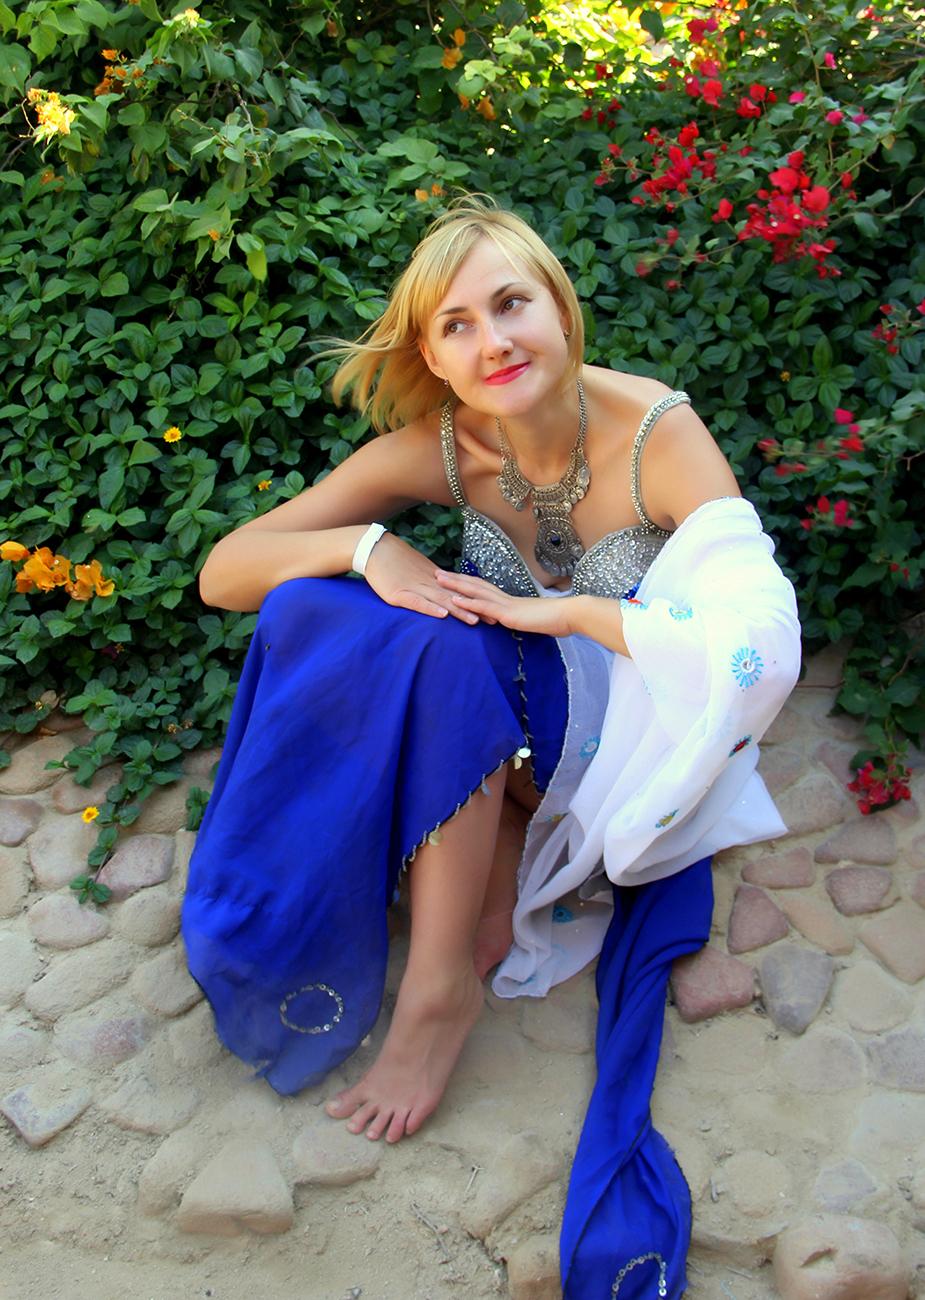 Agence rencontre femme ukrainienne